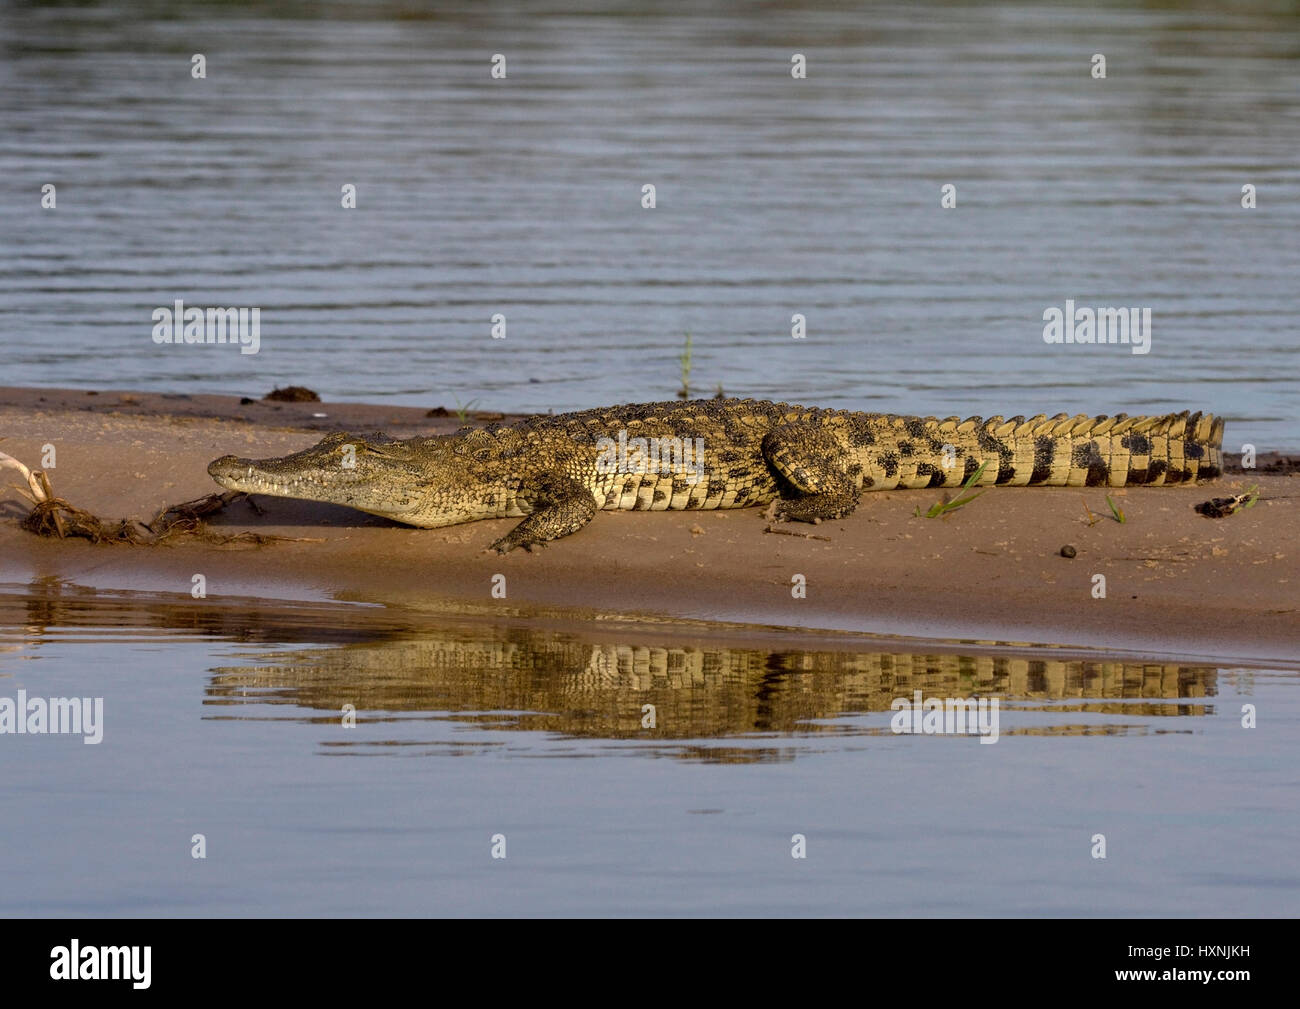 Nile crocodile, Crocodylus niloticus - Nile crocodile , Nilkrokodil | Crocodylus niloticus - Nile crocodile   Nilkrokodil - Stock Image